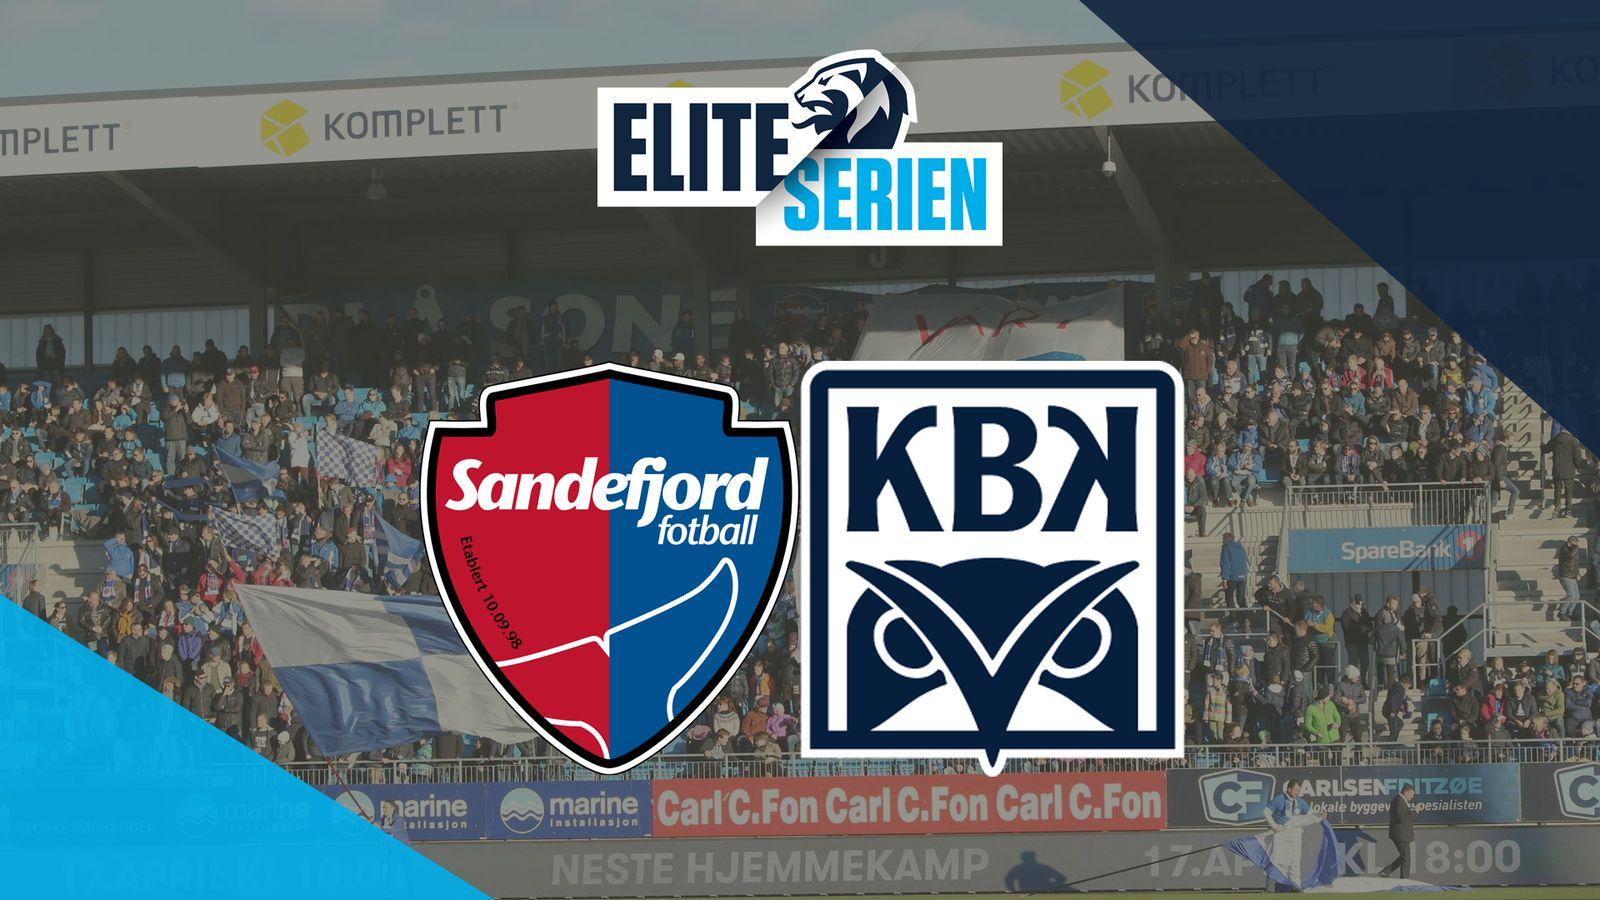 Allsvenskan Sandefjord Fotball Kristiansund Bk 16e Journee Suivez La Rencontre En Integralite Et En Version Norvegienne Eurosport